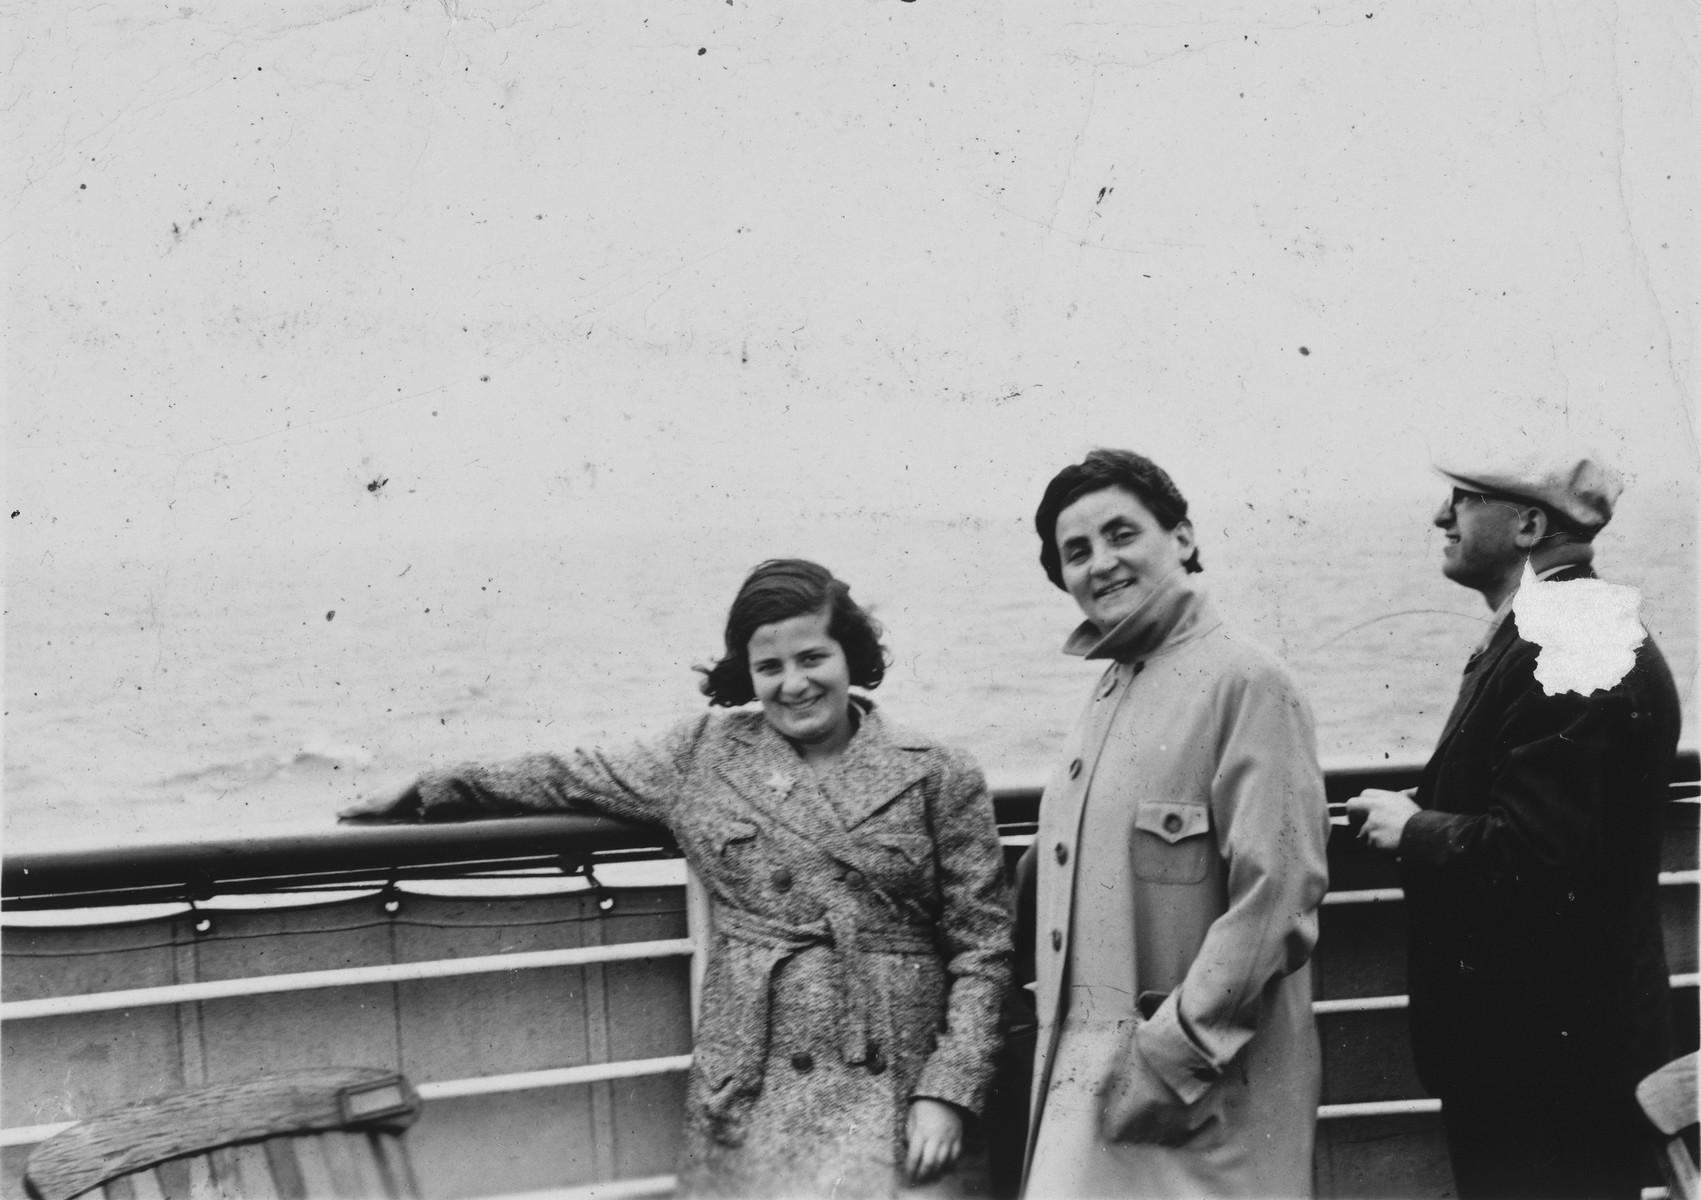 Loewinsohn family on board the MS St. Louis.  (Girl at left is Hella Loewinsohn.)